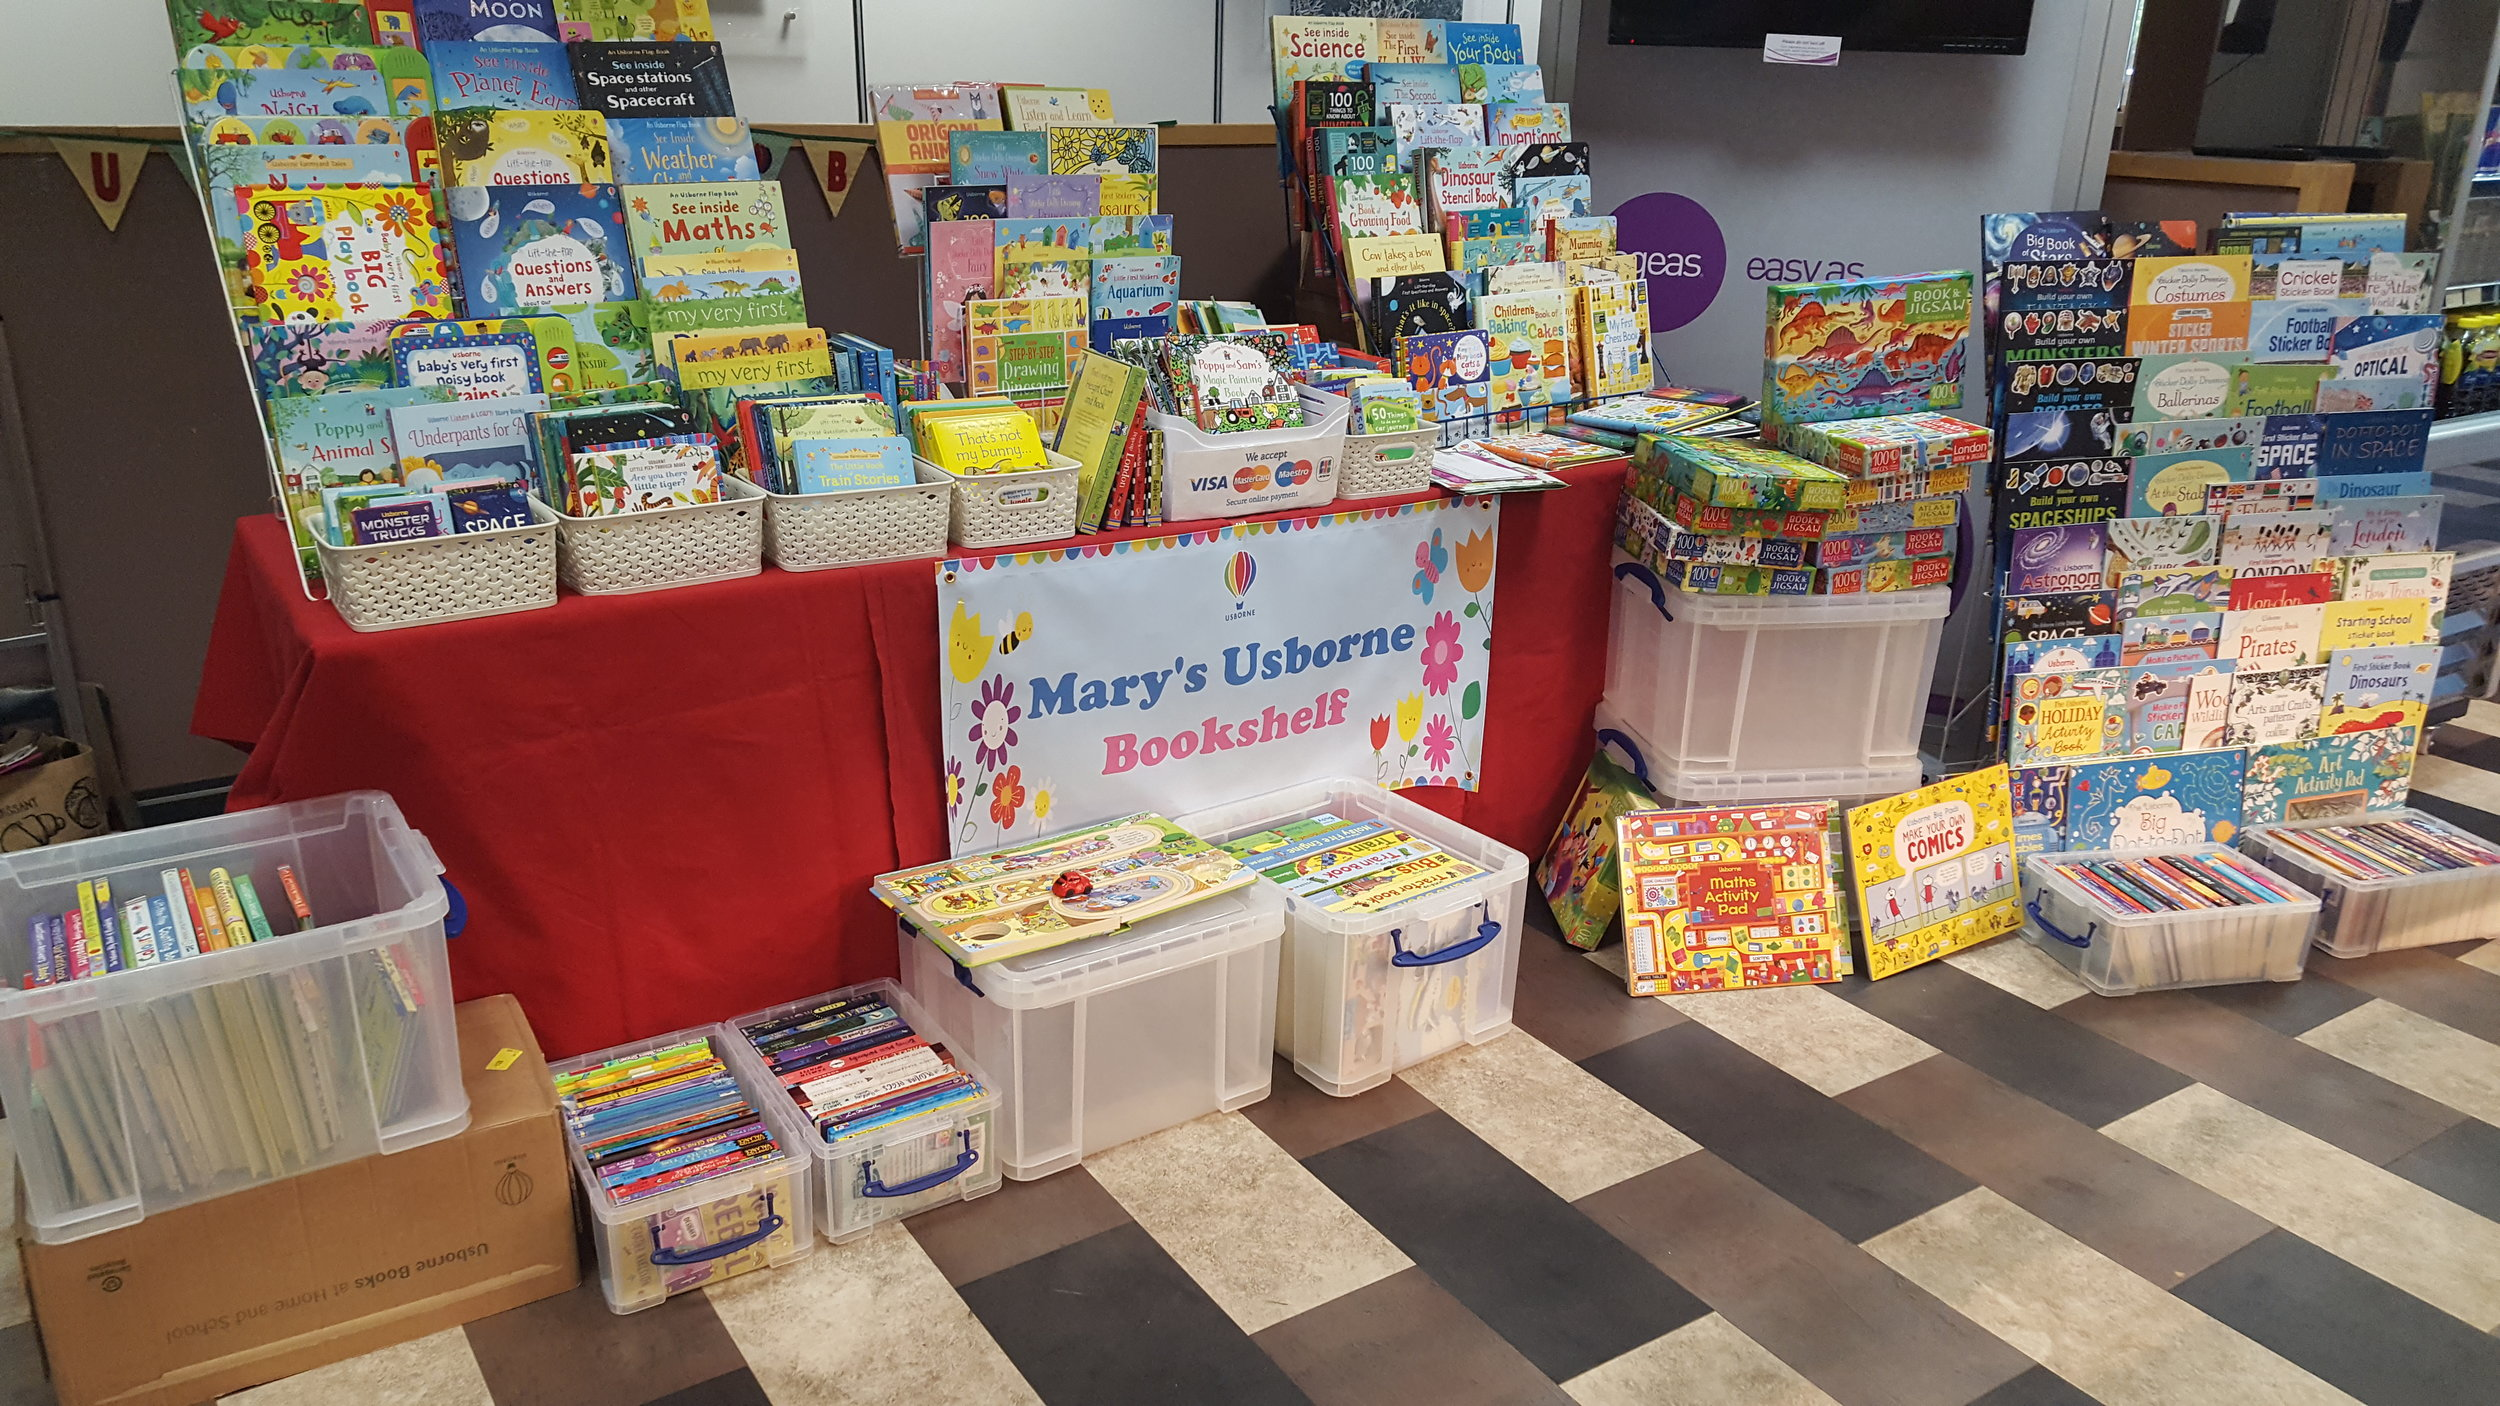 Mary's Usborne Bookshelf